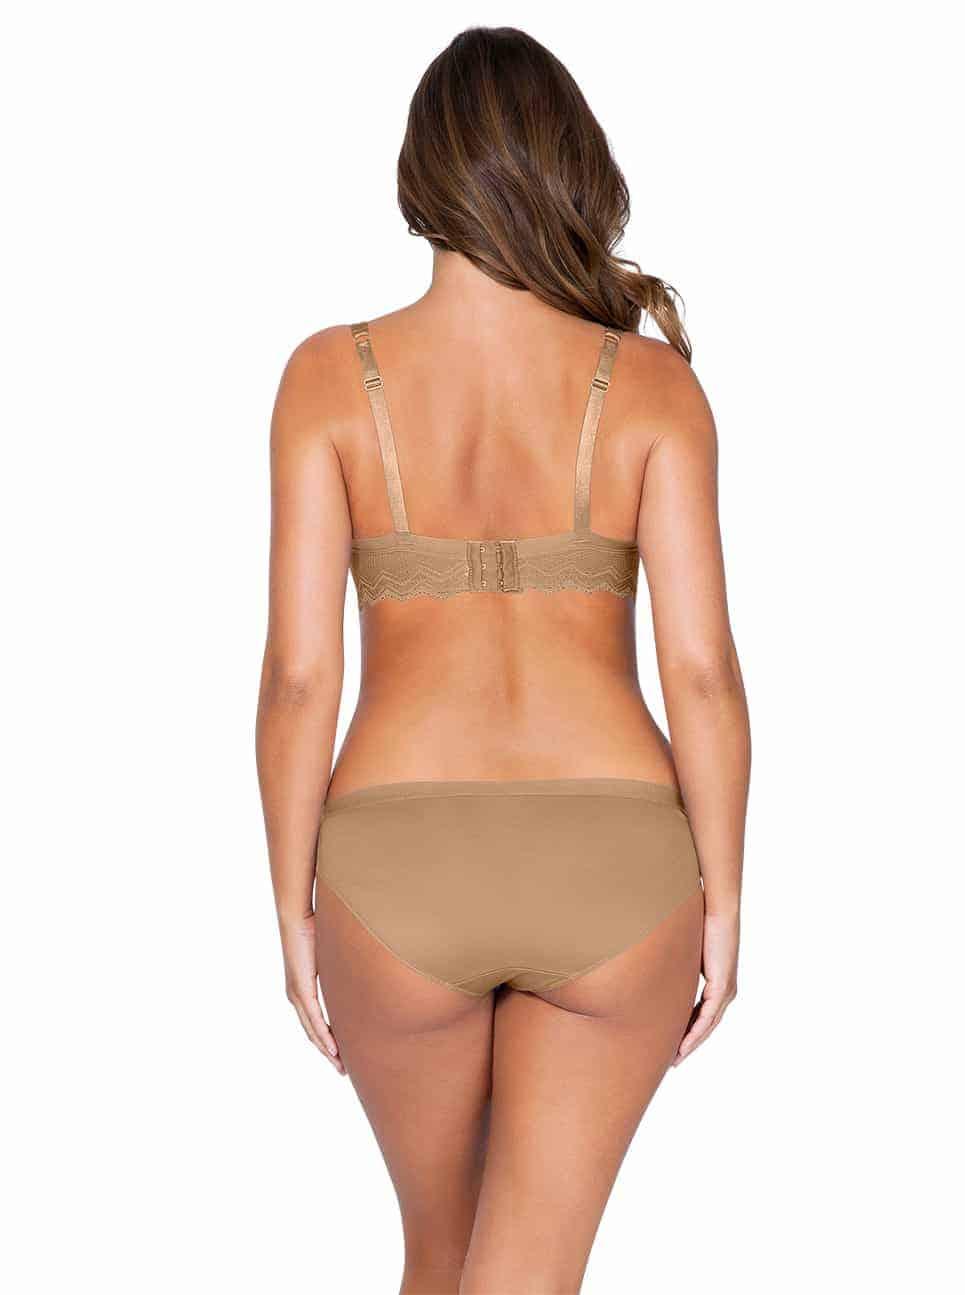 Lydie P5441ContourPadded P5443 Bikini NudeBack copy - Lydie Bikini – European Nude – P5443